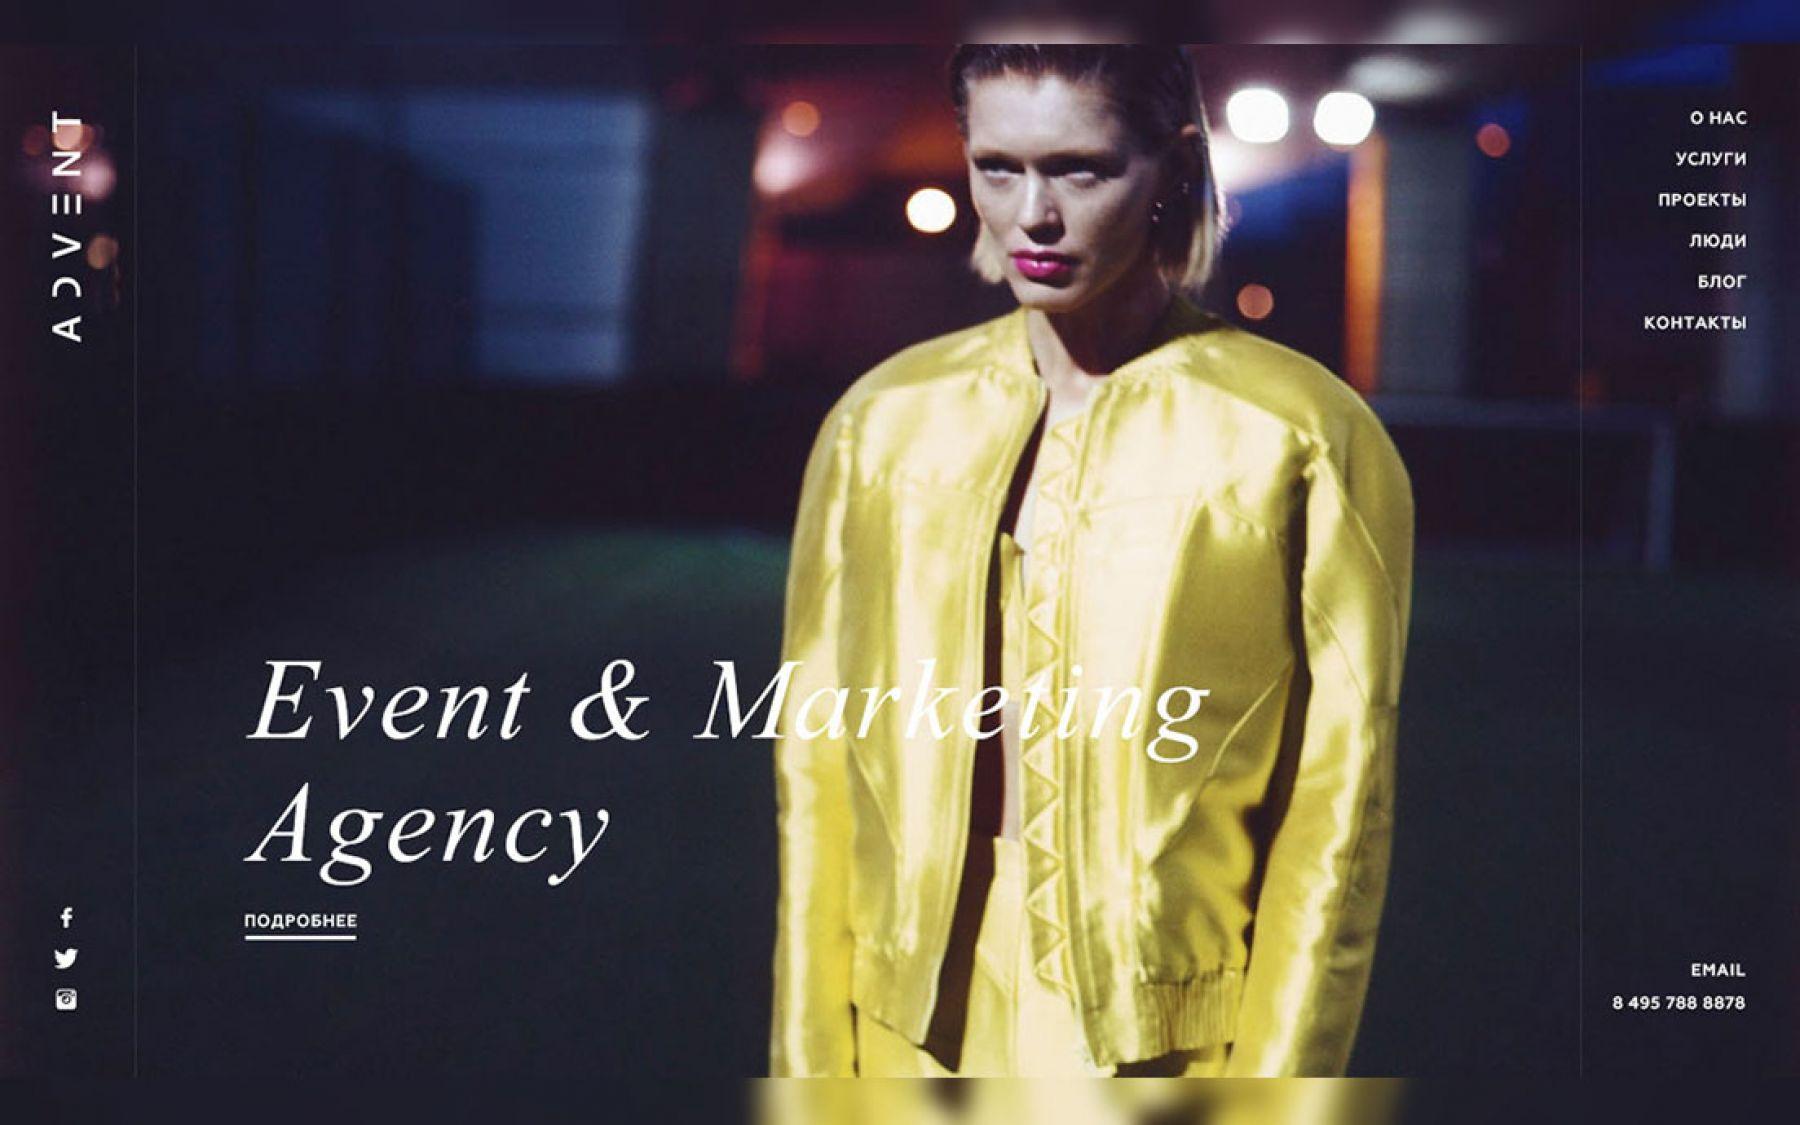 BLT Agency